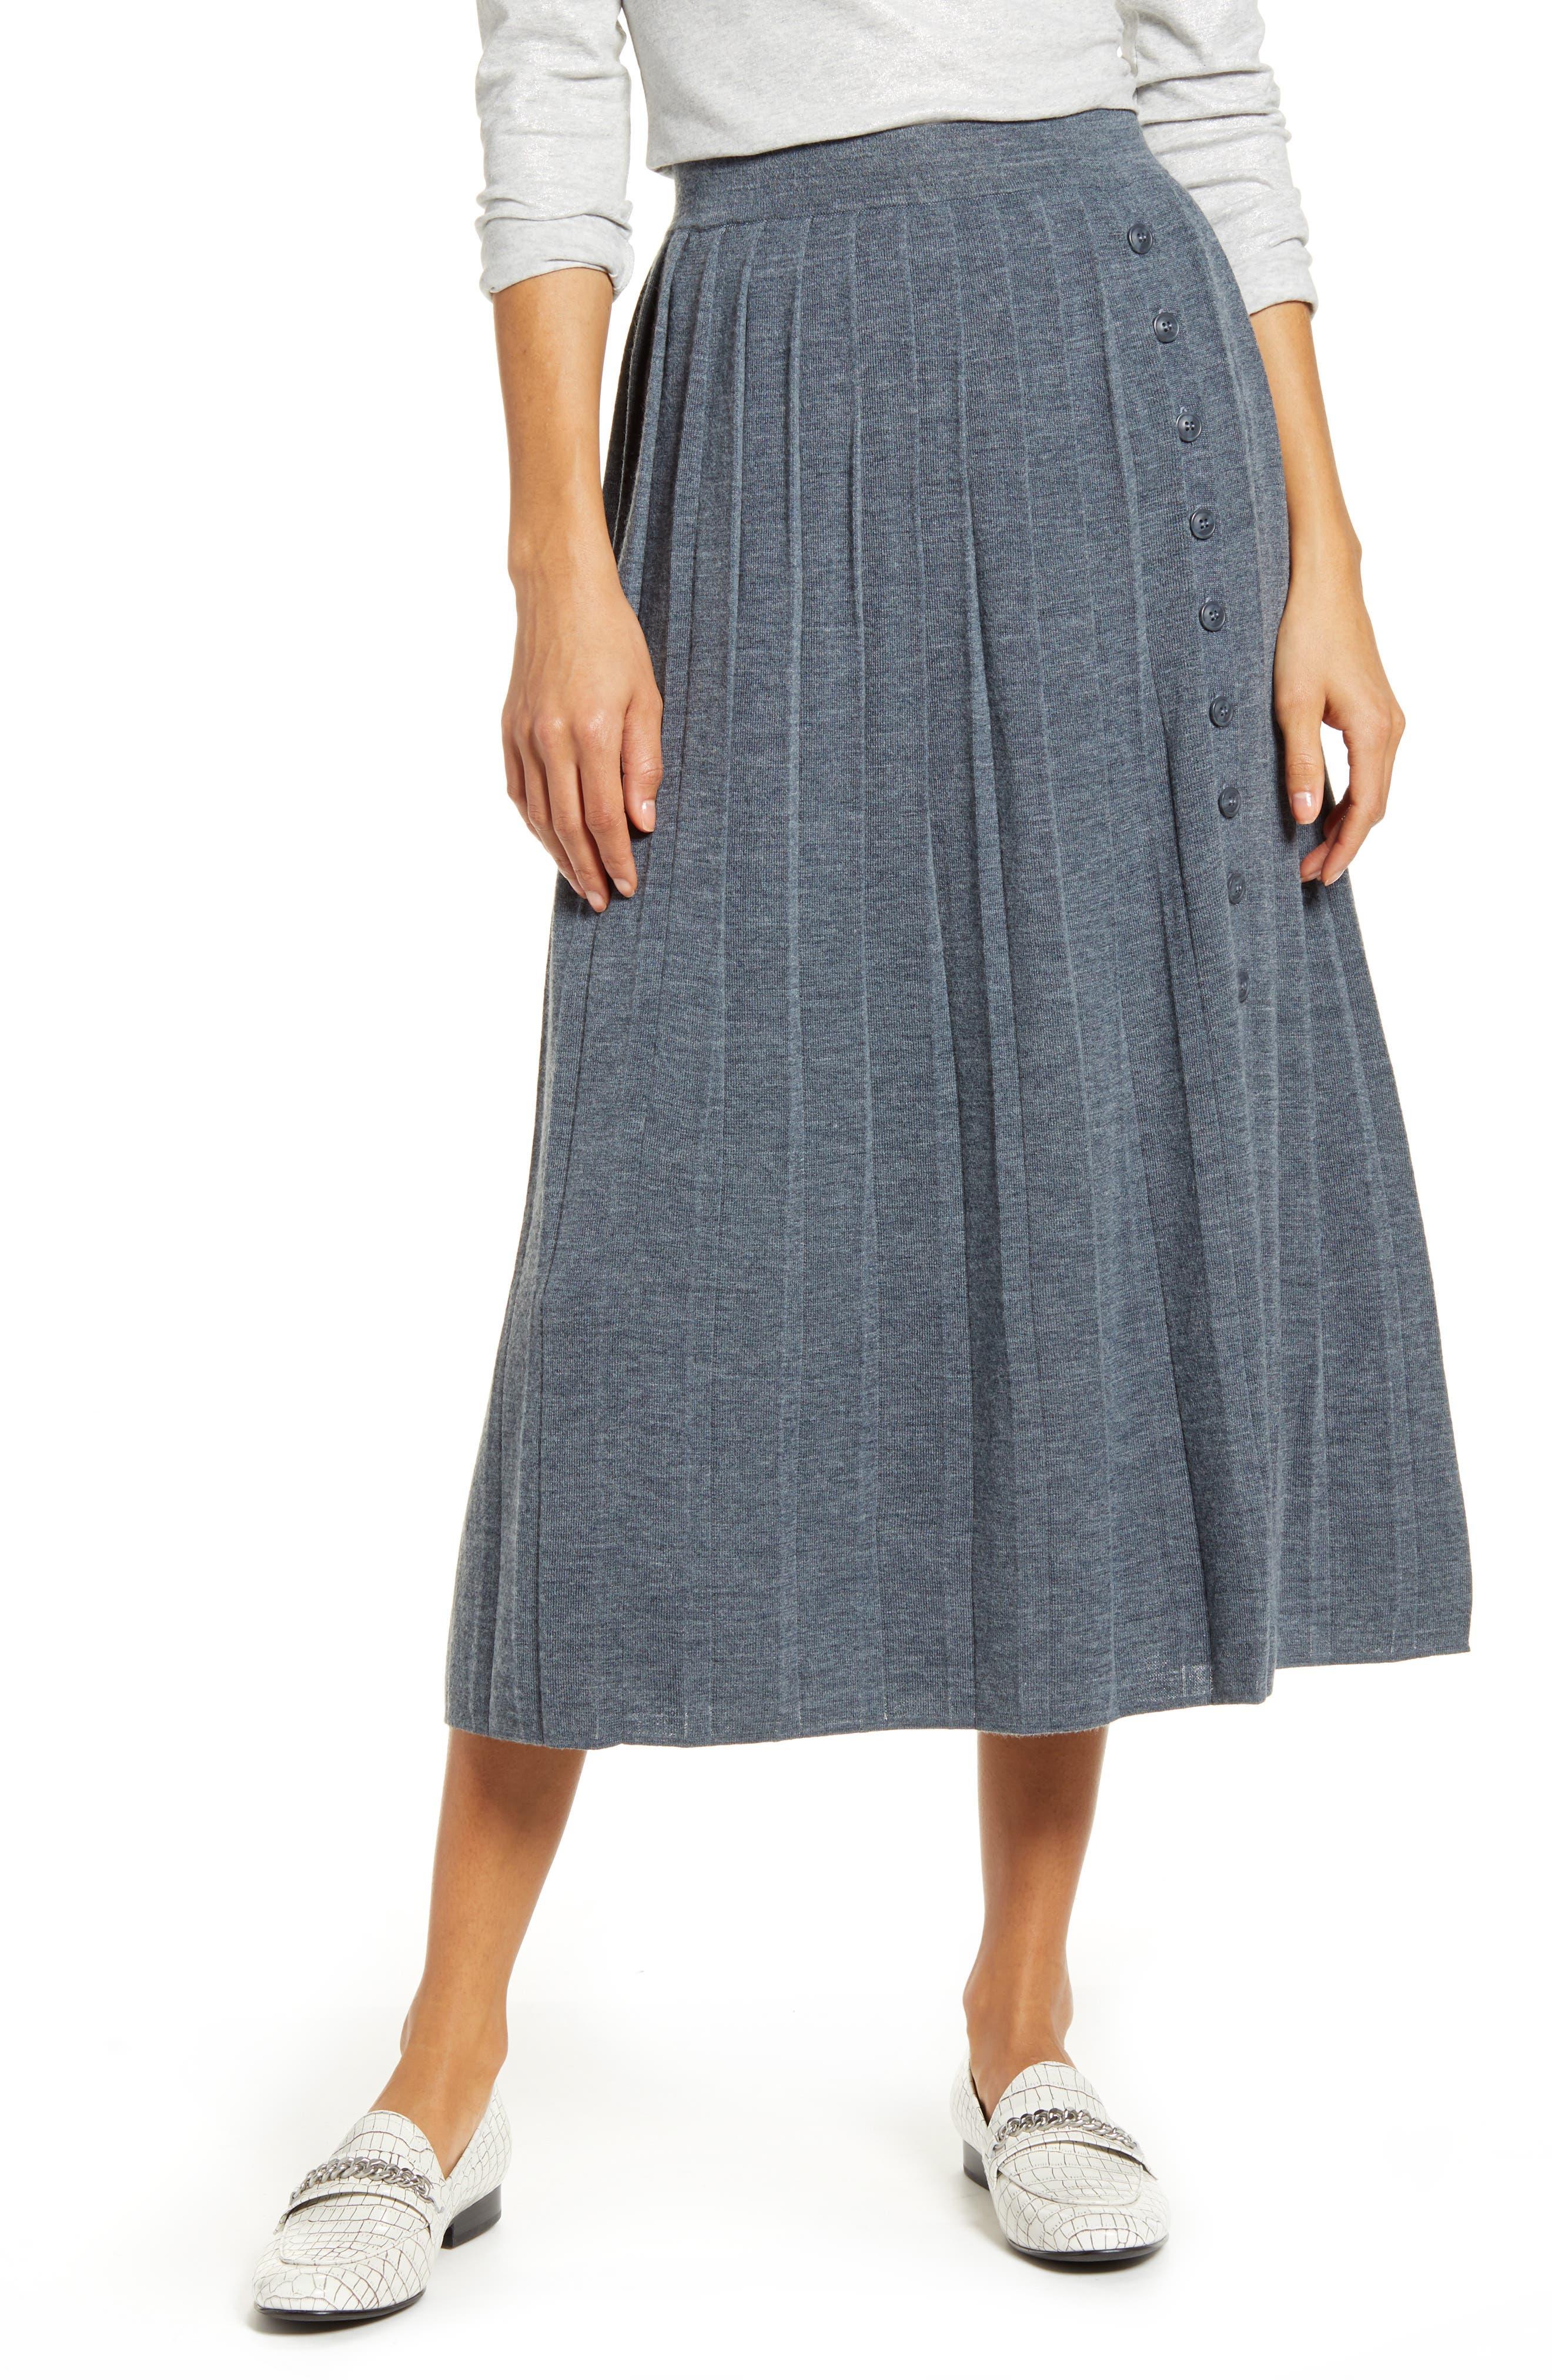 Victorian Skirts | Bustle, Walking, Edwardian Skirts Womens 1901 Pleated Sweater Skirt Size Large - Grey $53.40 AT vintagedancer.com